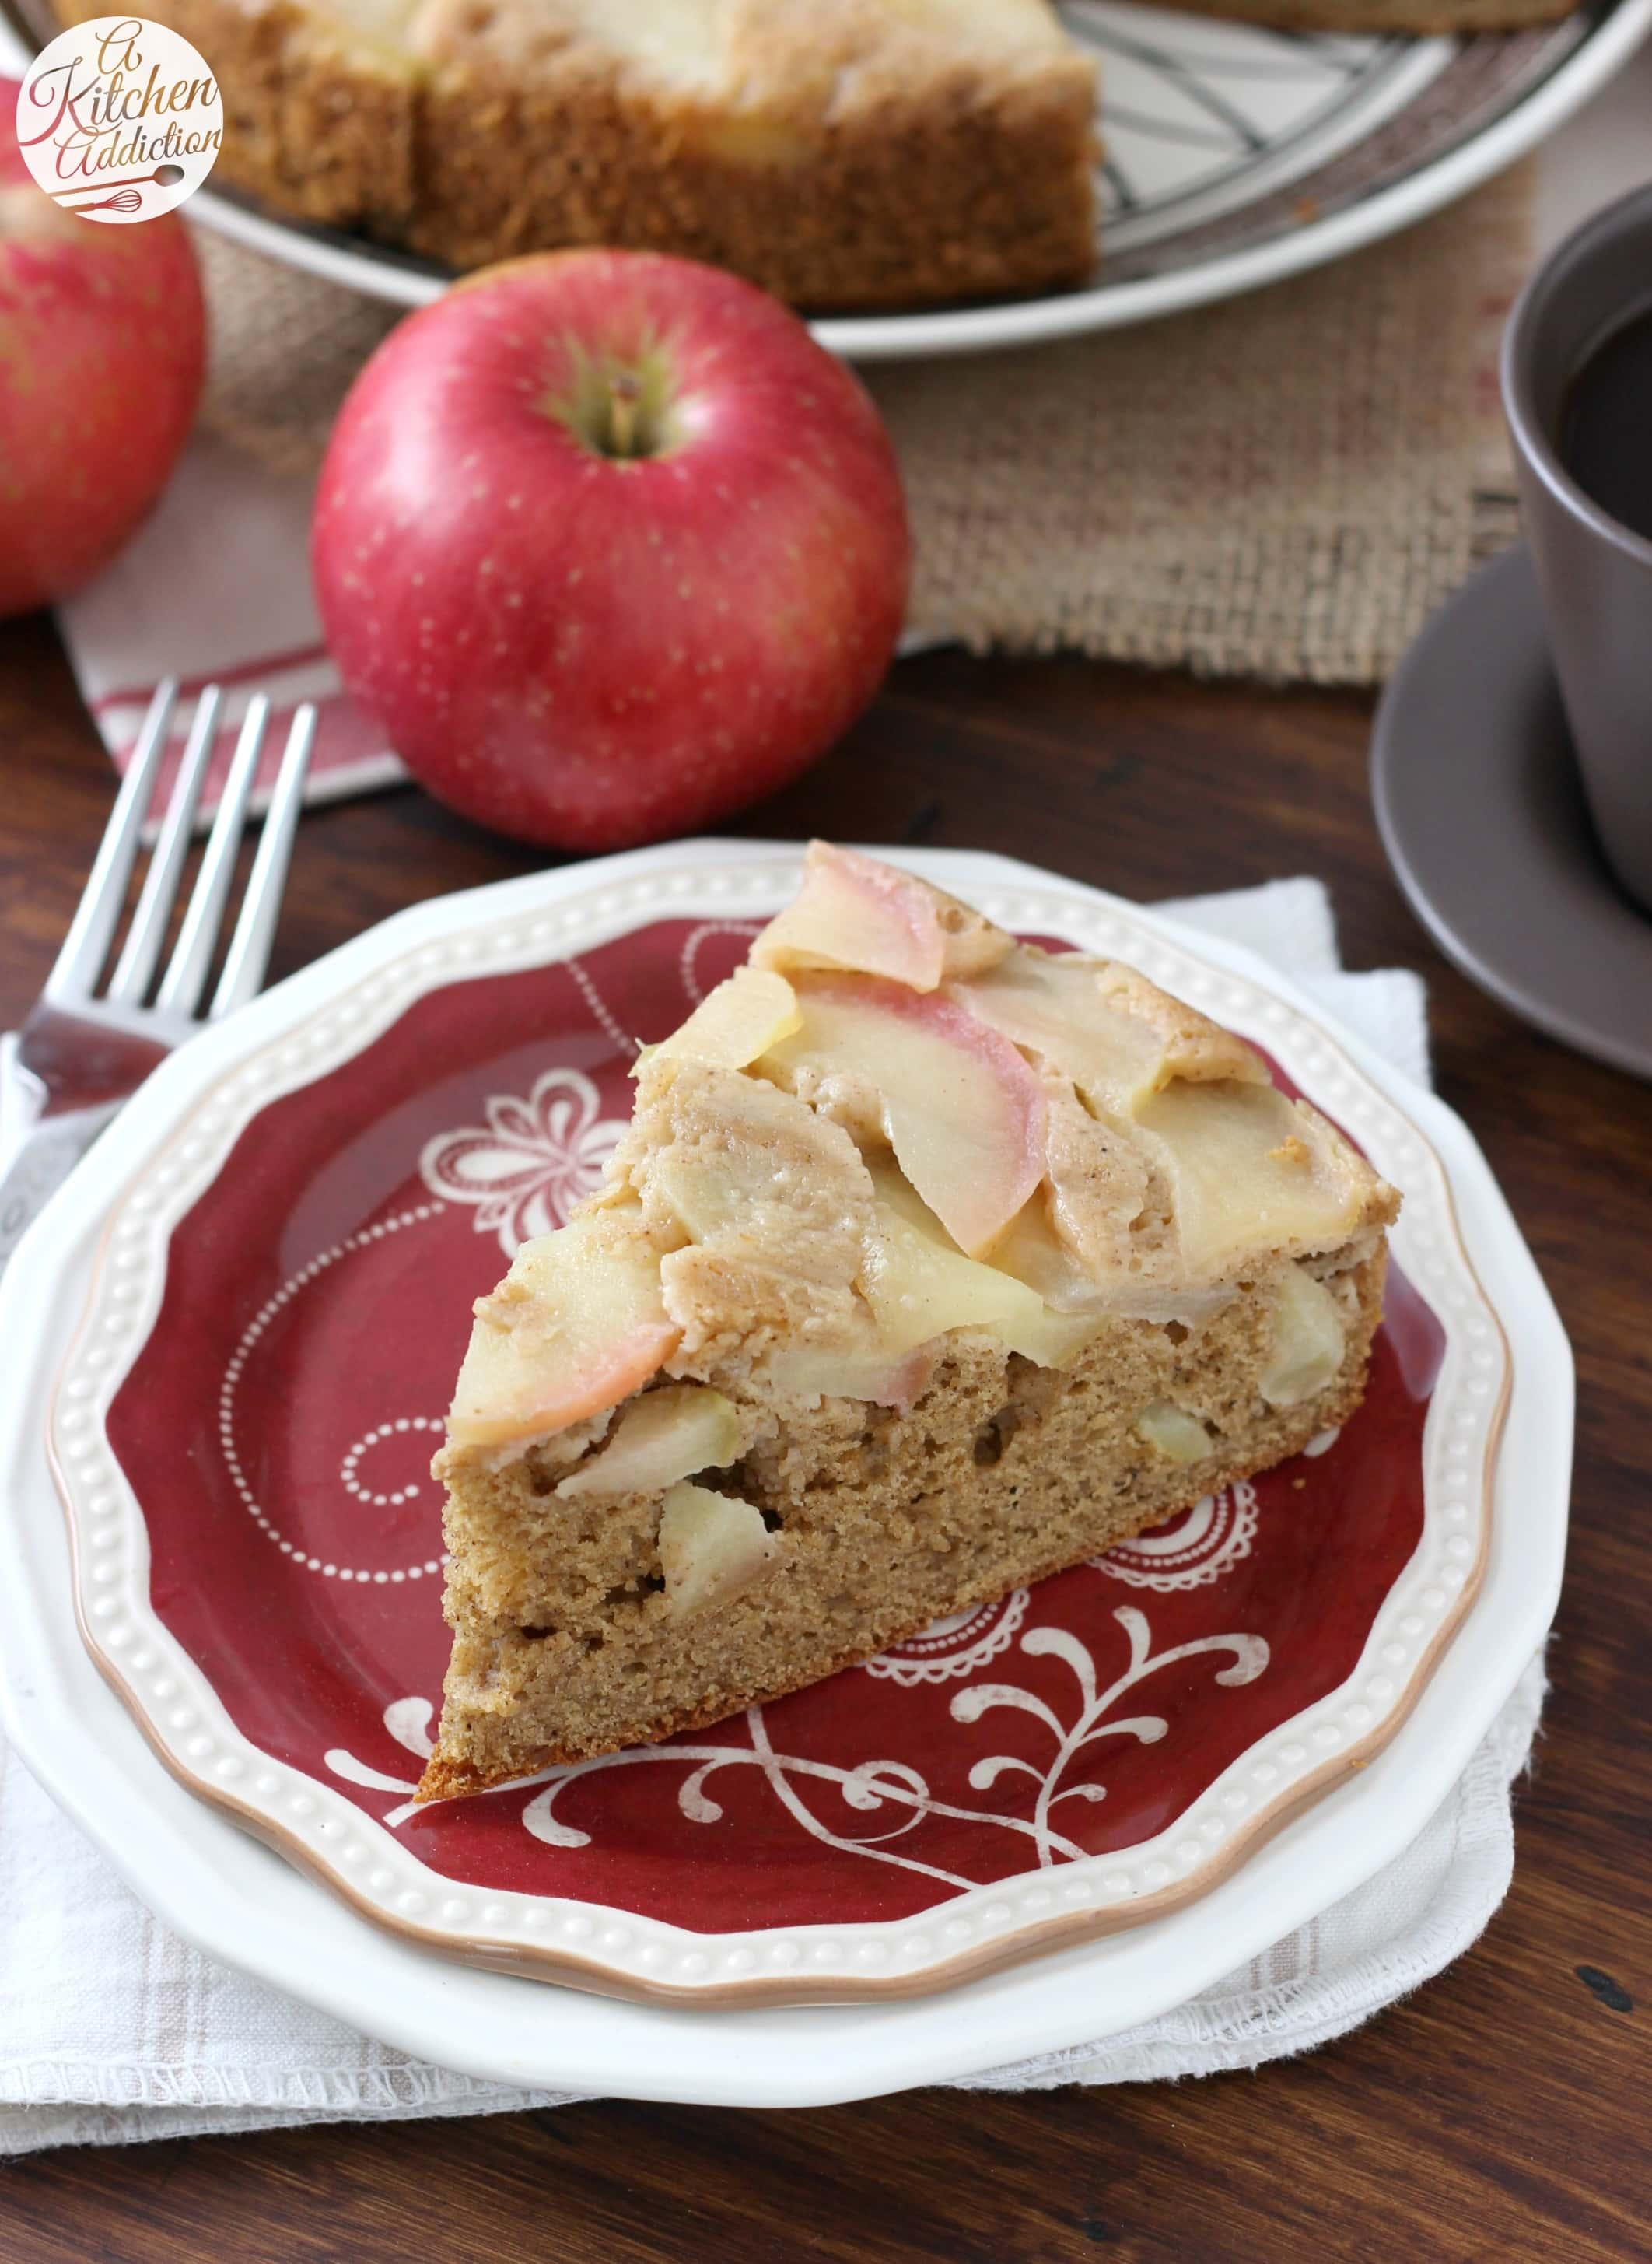 Honey Apple Upside Down Yogurt Cake Recipe from A Kitchen Addiction